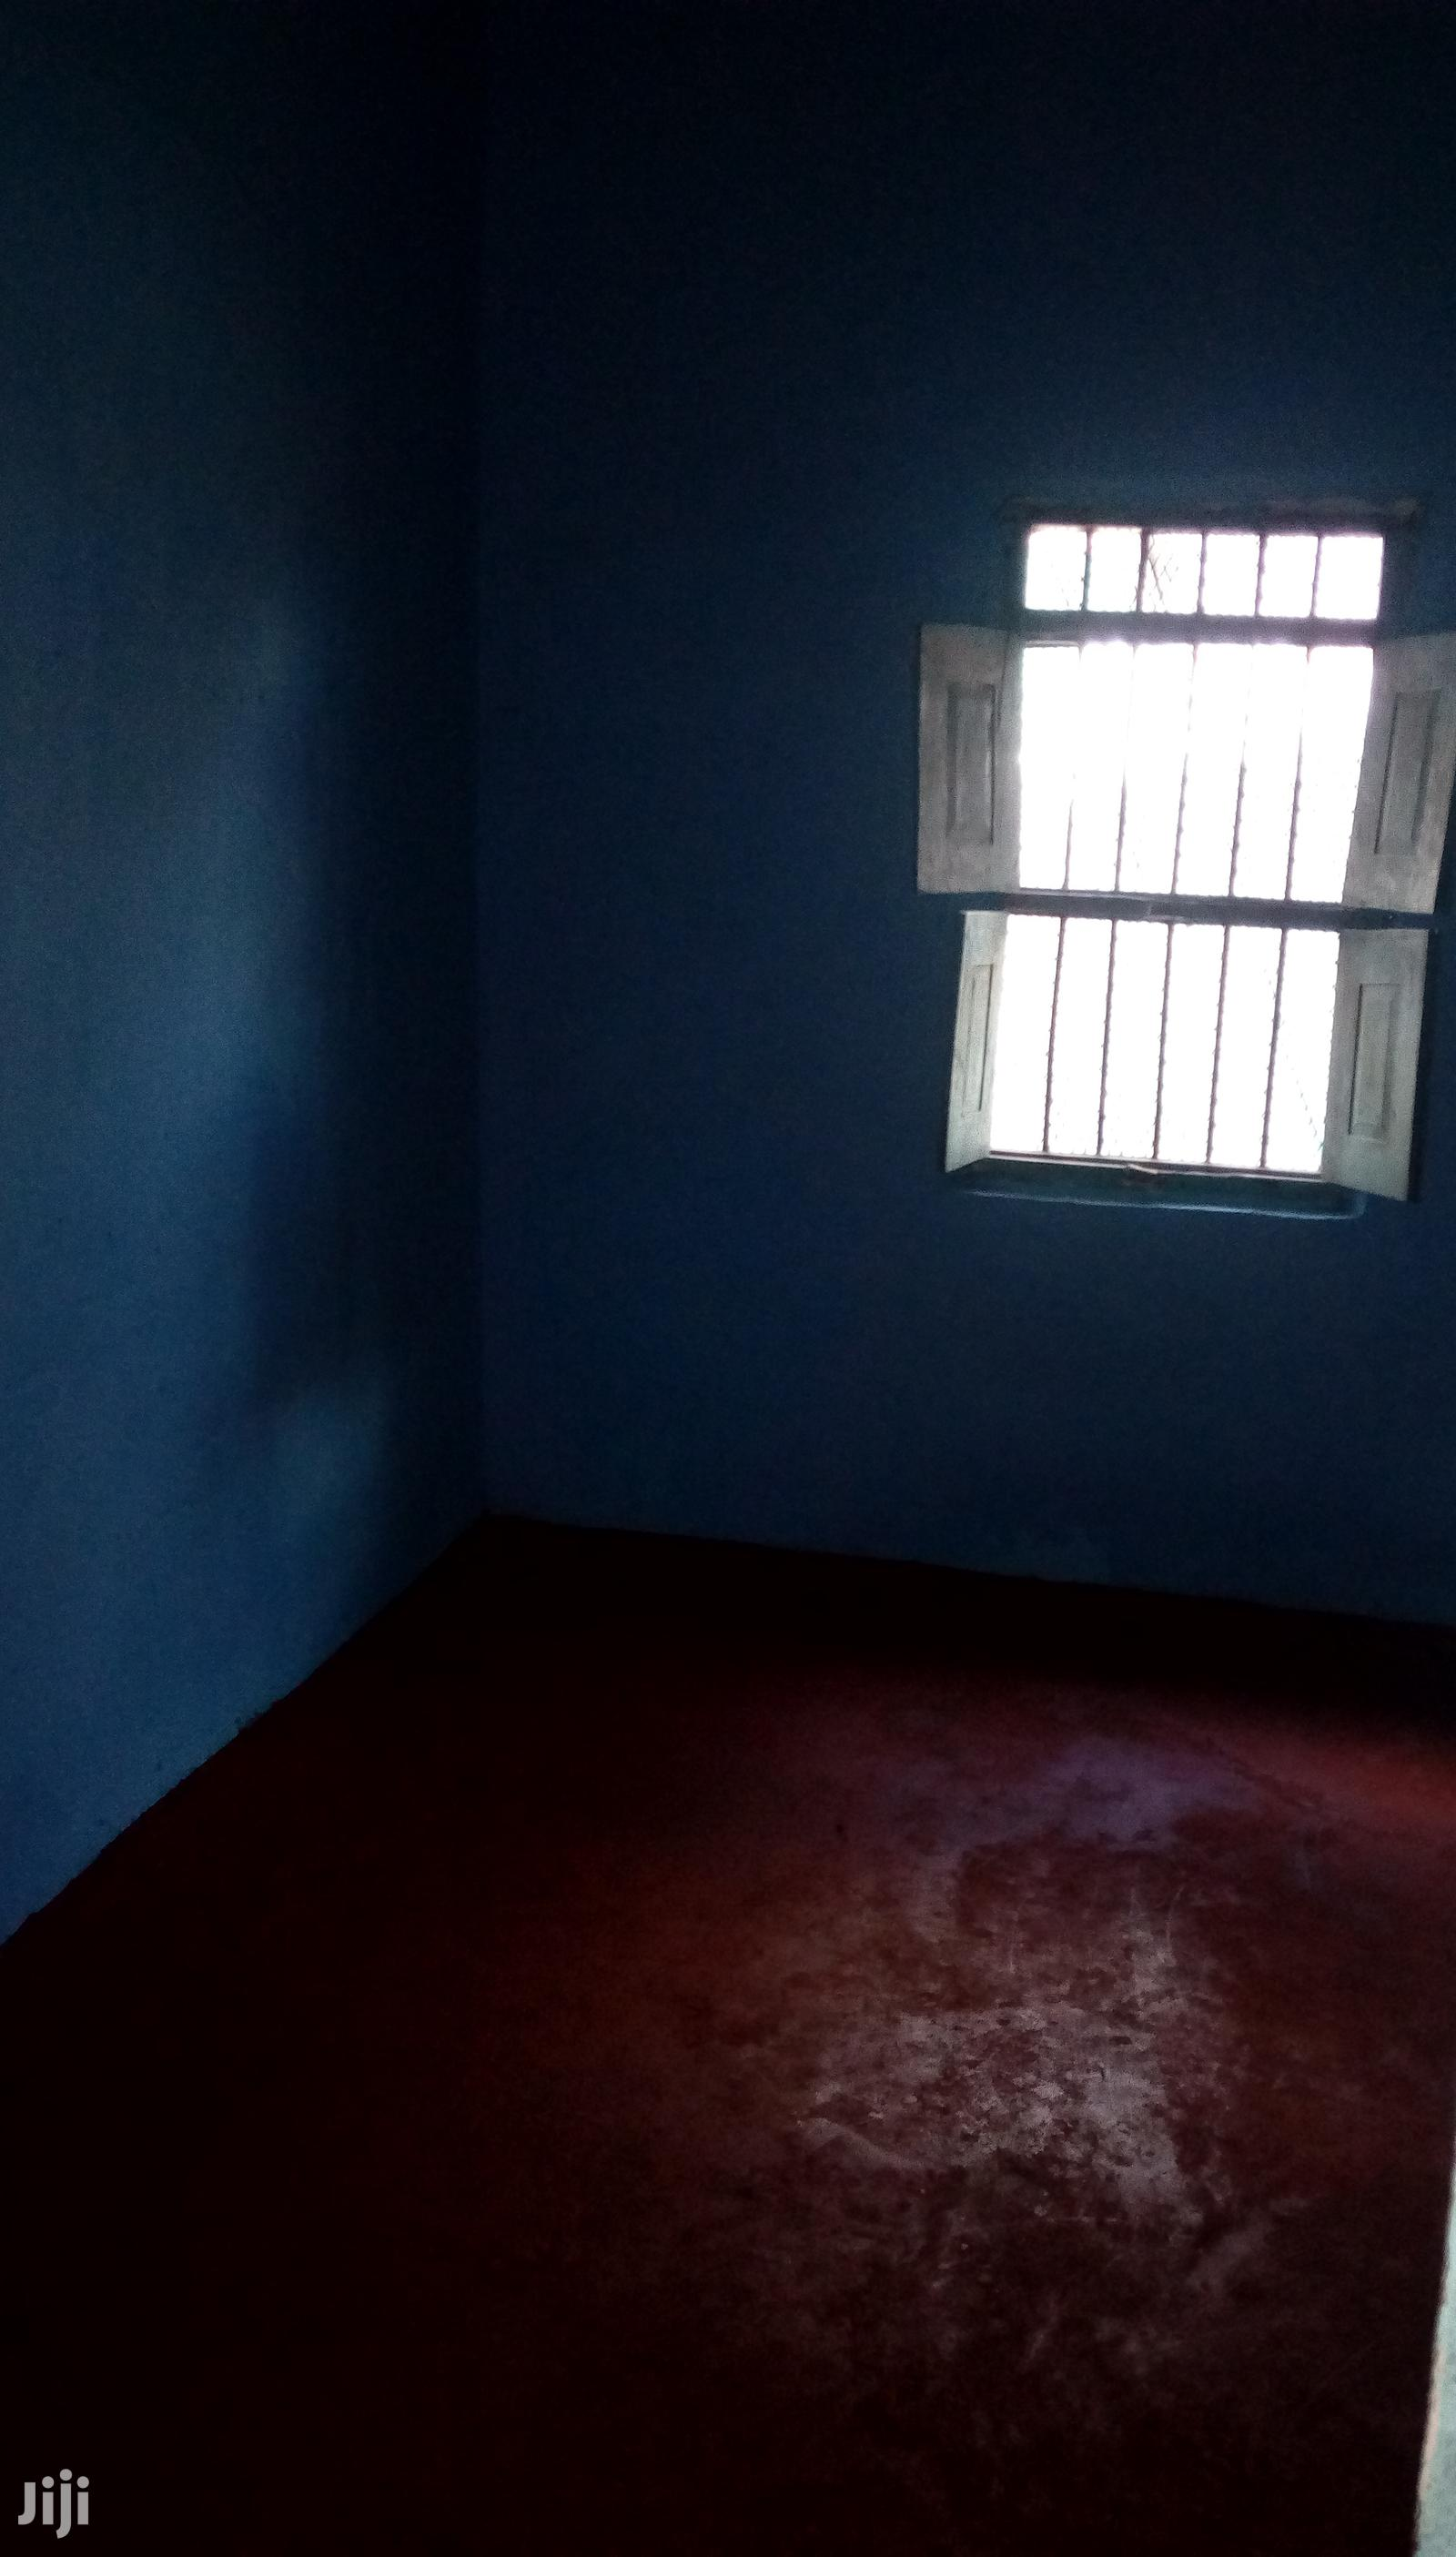 Single Room to Let at Kongowea-Kwa Karama (Ref Hse 277)